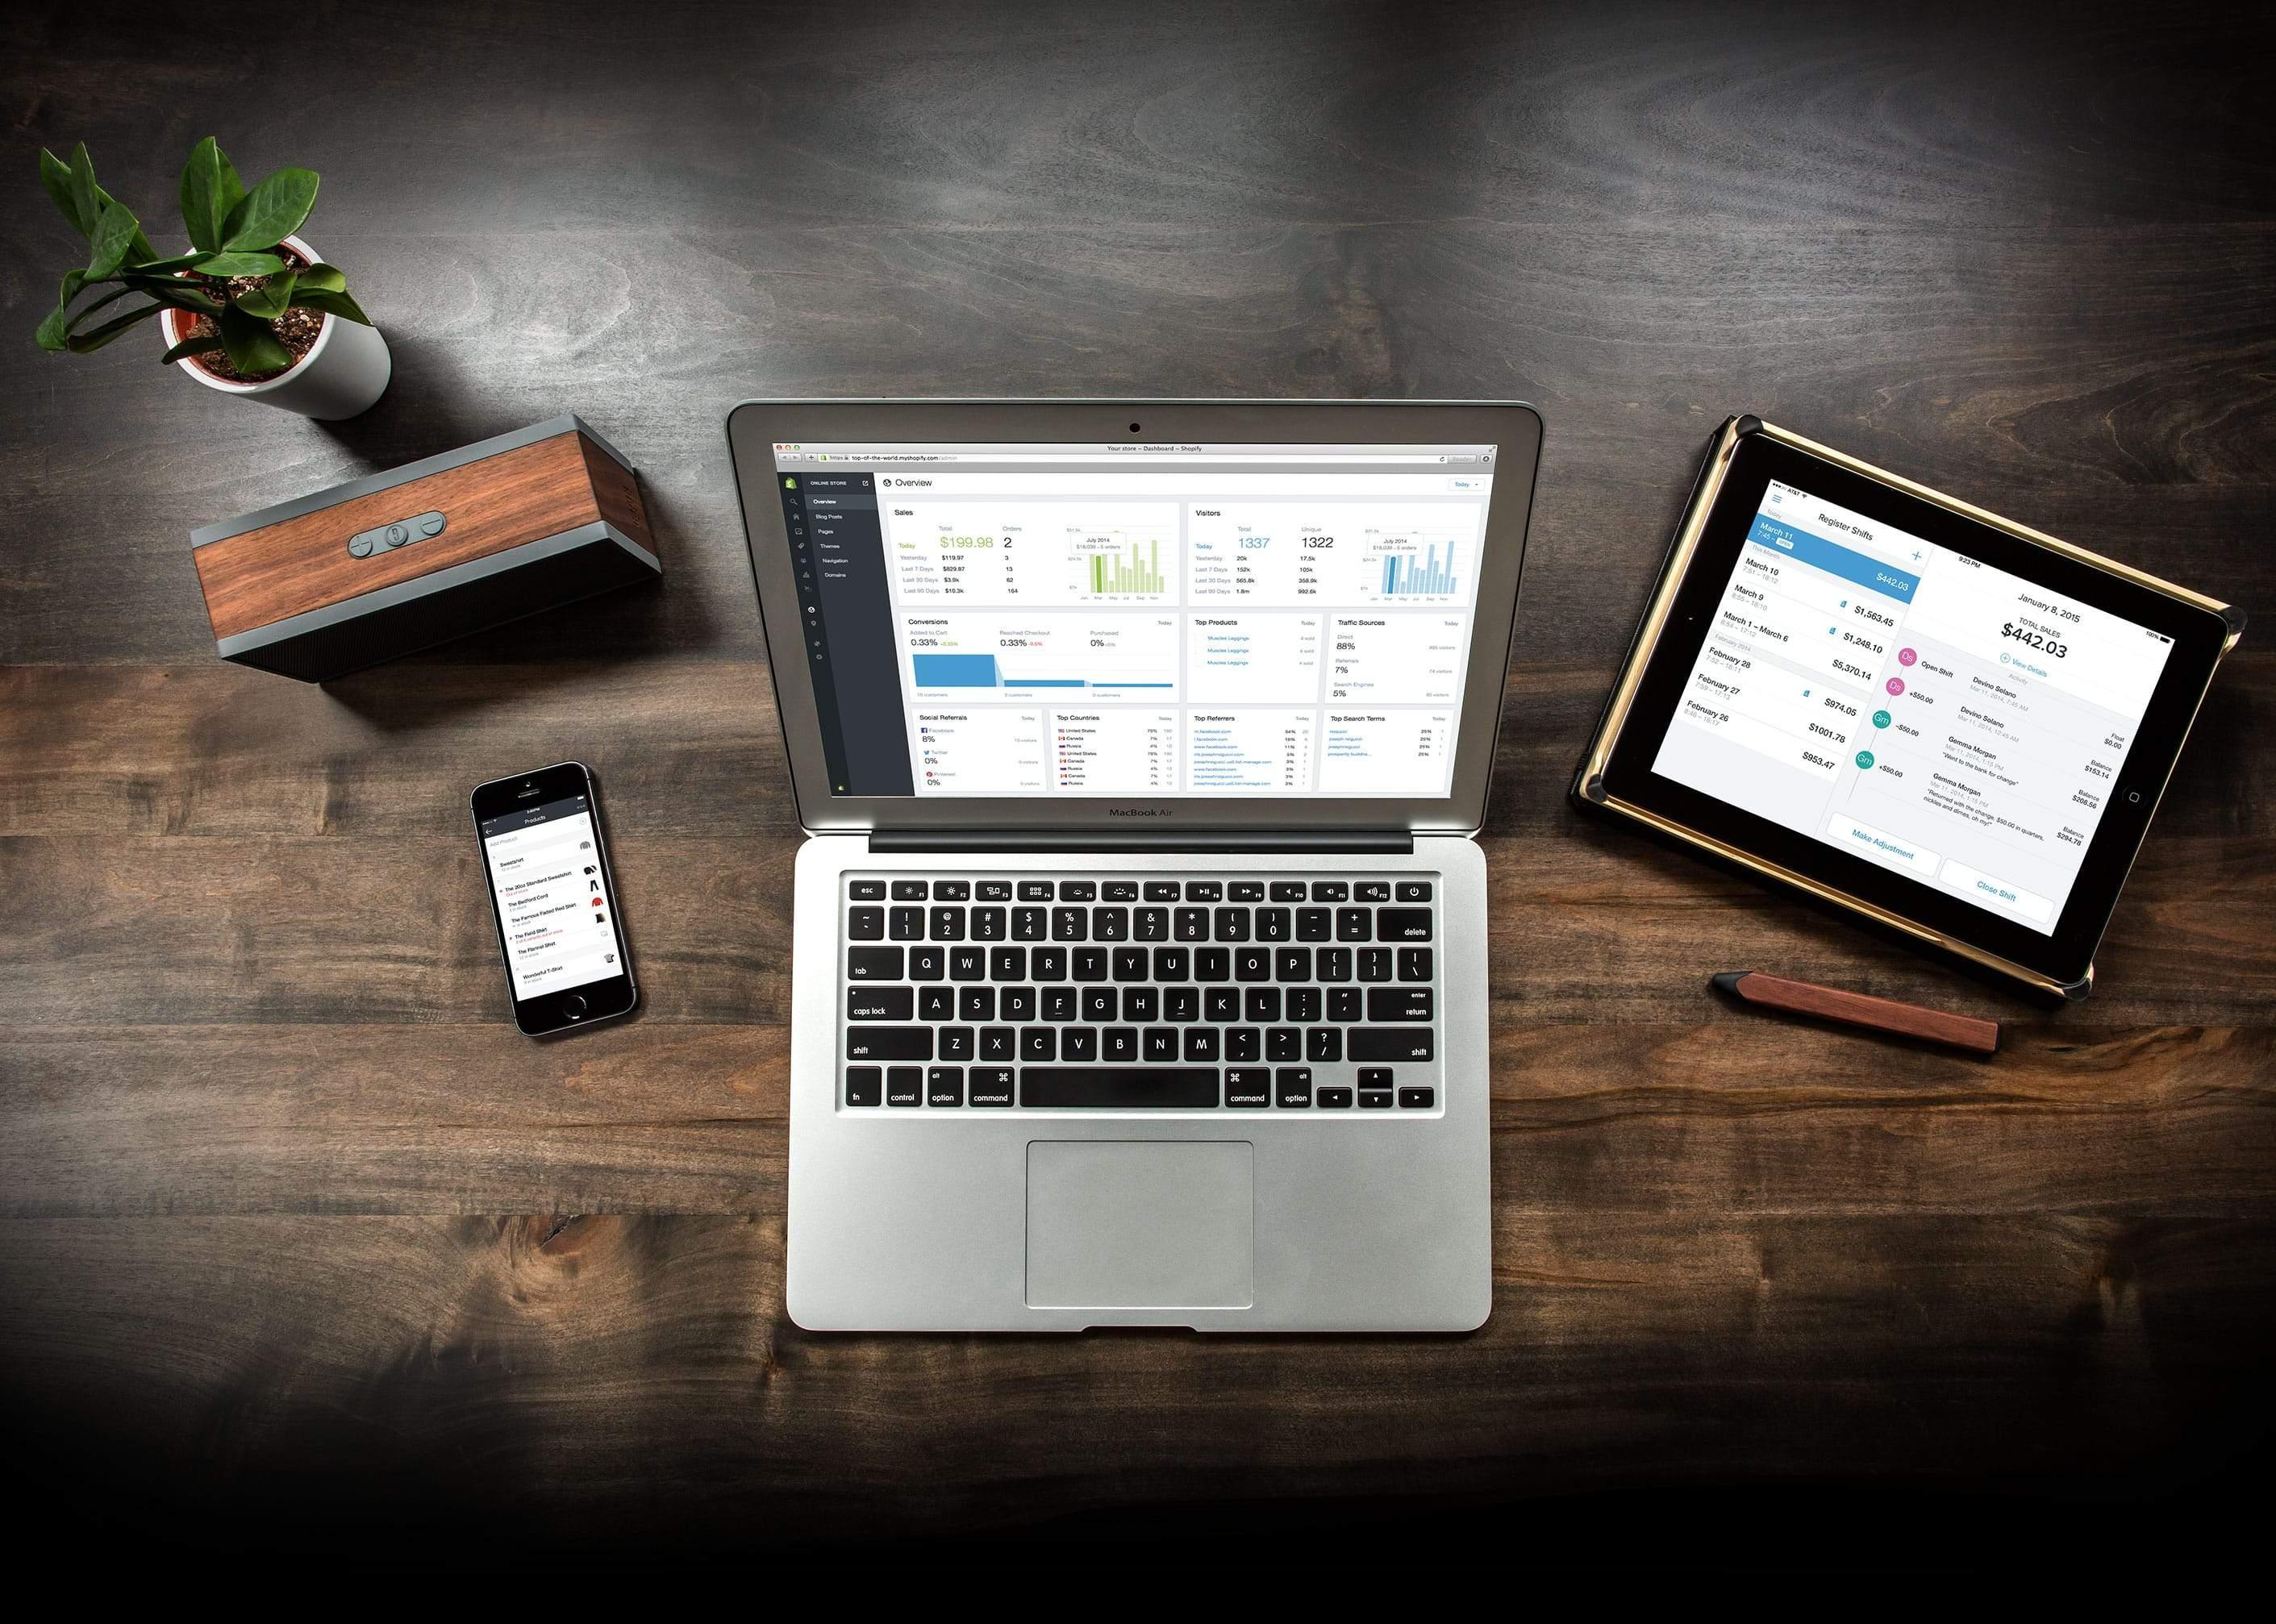 Shopify Laptop tablet smartphone